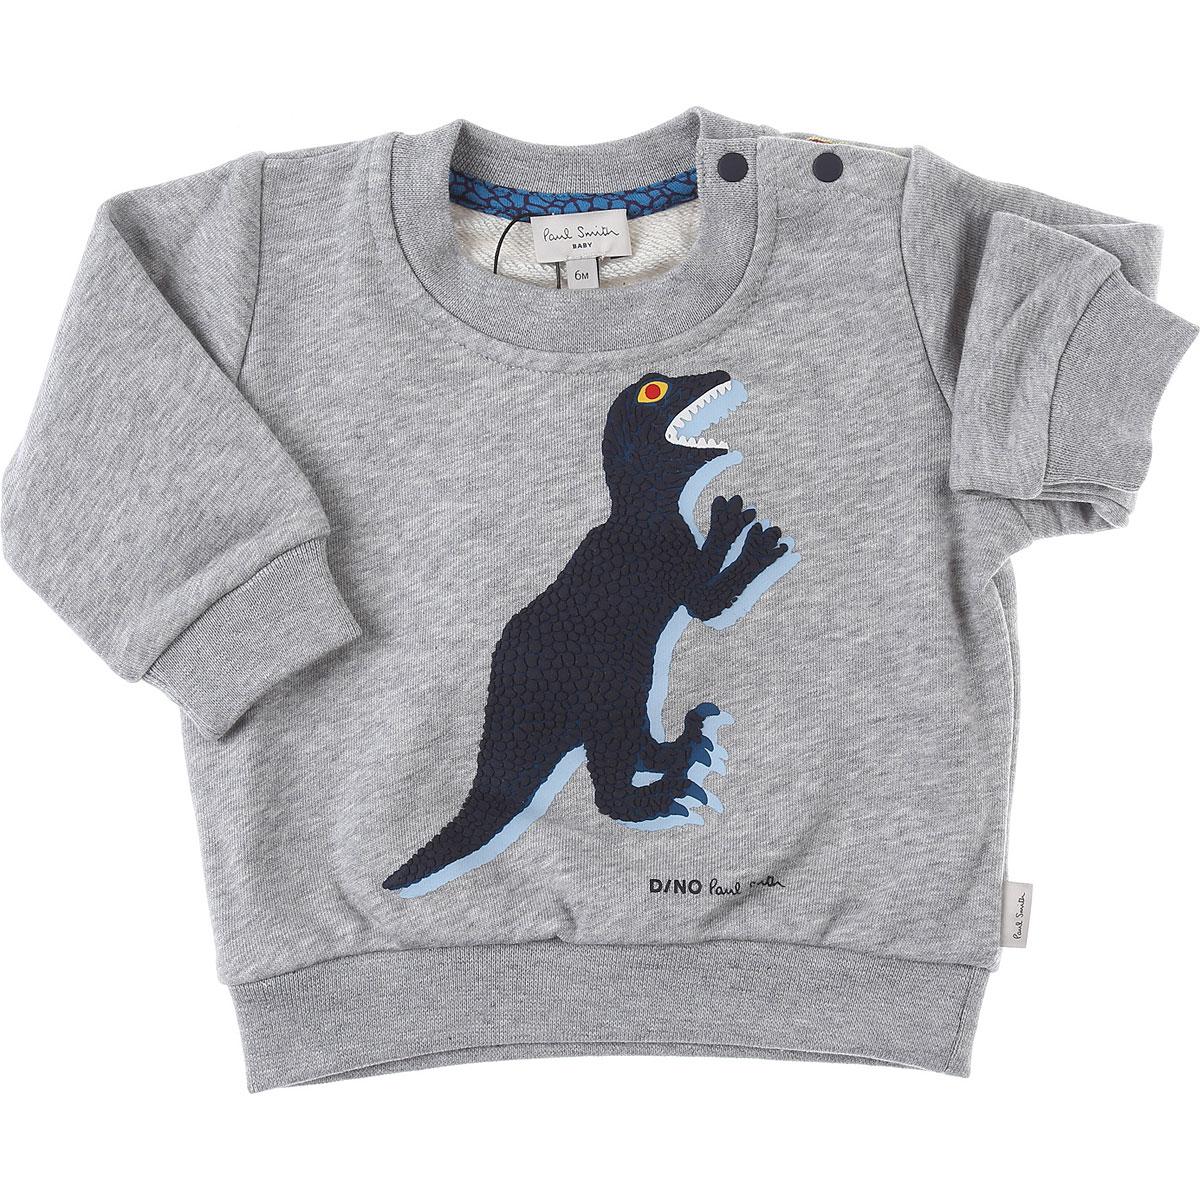 Paul Smith Baby Sweatshirts & Hoodies for Boys On Sale, Grey, Cotton, 2019, 12 M 18M 2Y 3Y 6M 9M